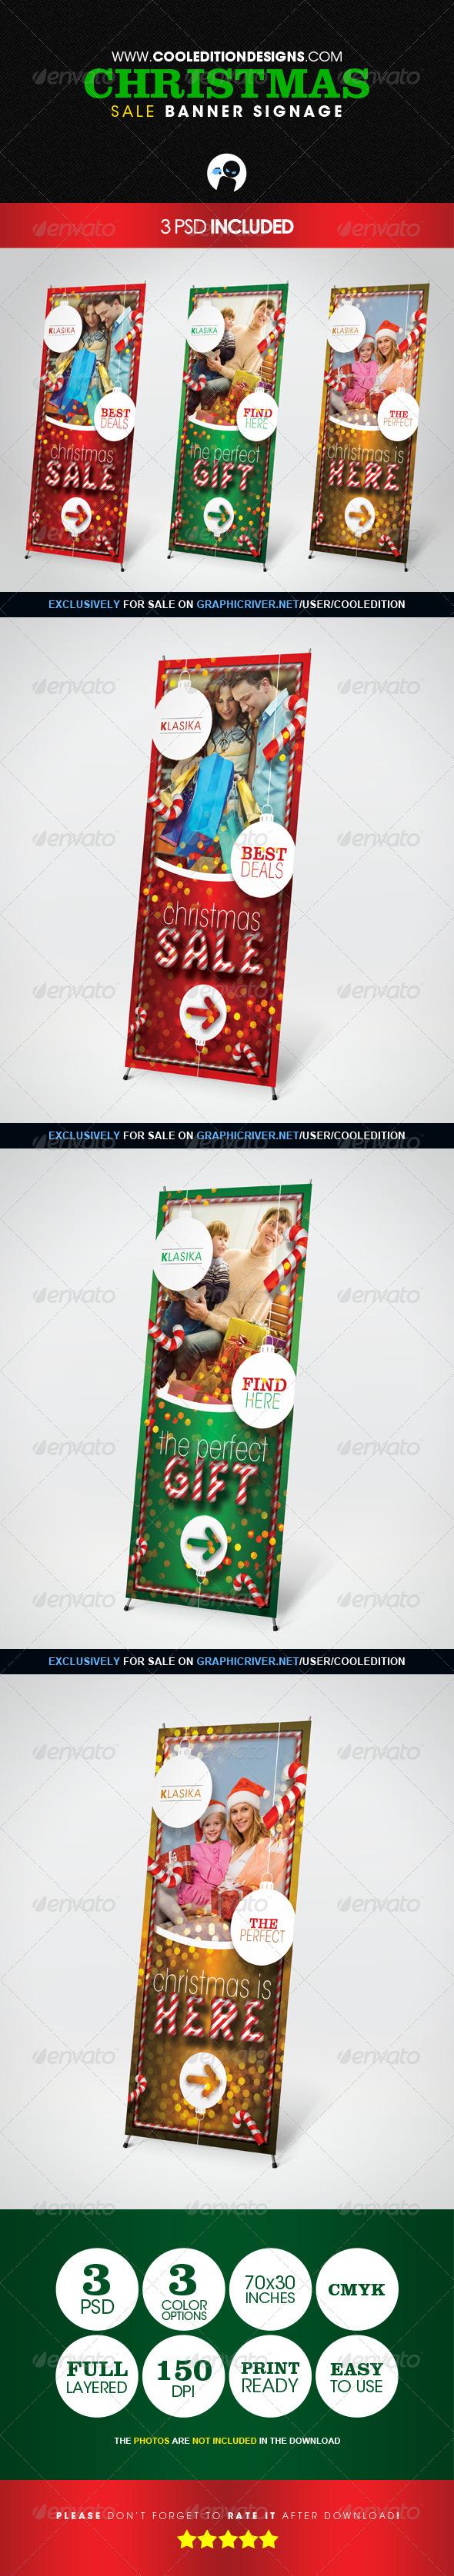 Christmas Sale Banner Signage - Signage Print Templates